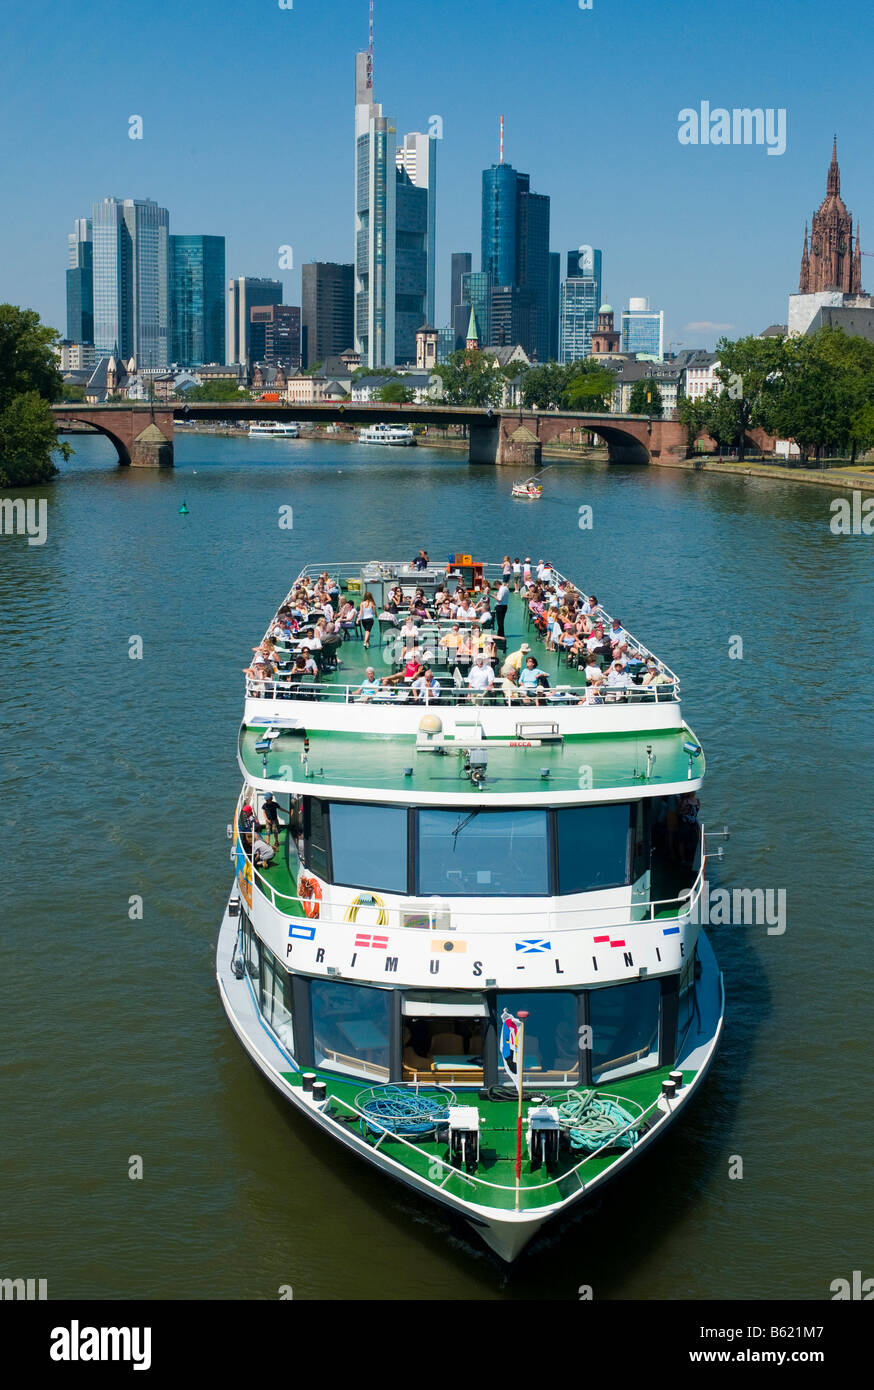 Tourist ship on the Main River, skyline of Frankfurt, Hesse, Germany, Europe - Stock Image